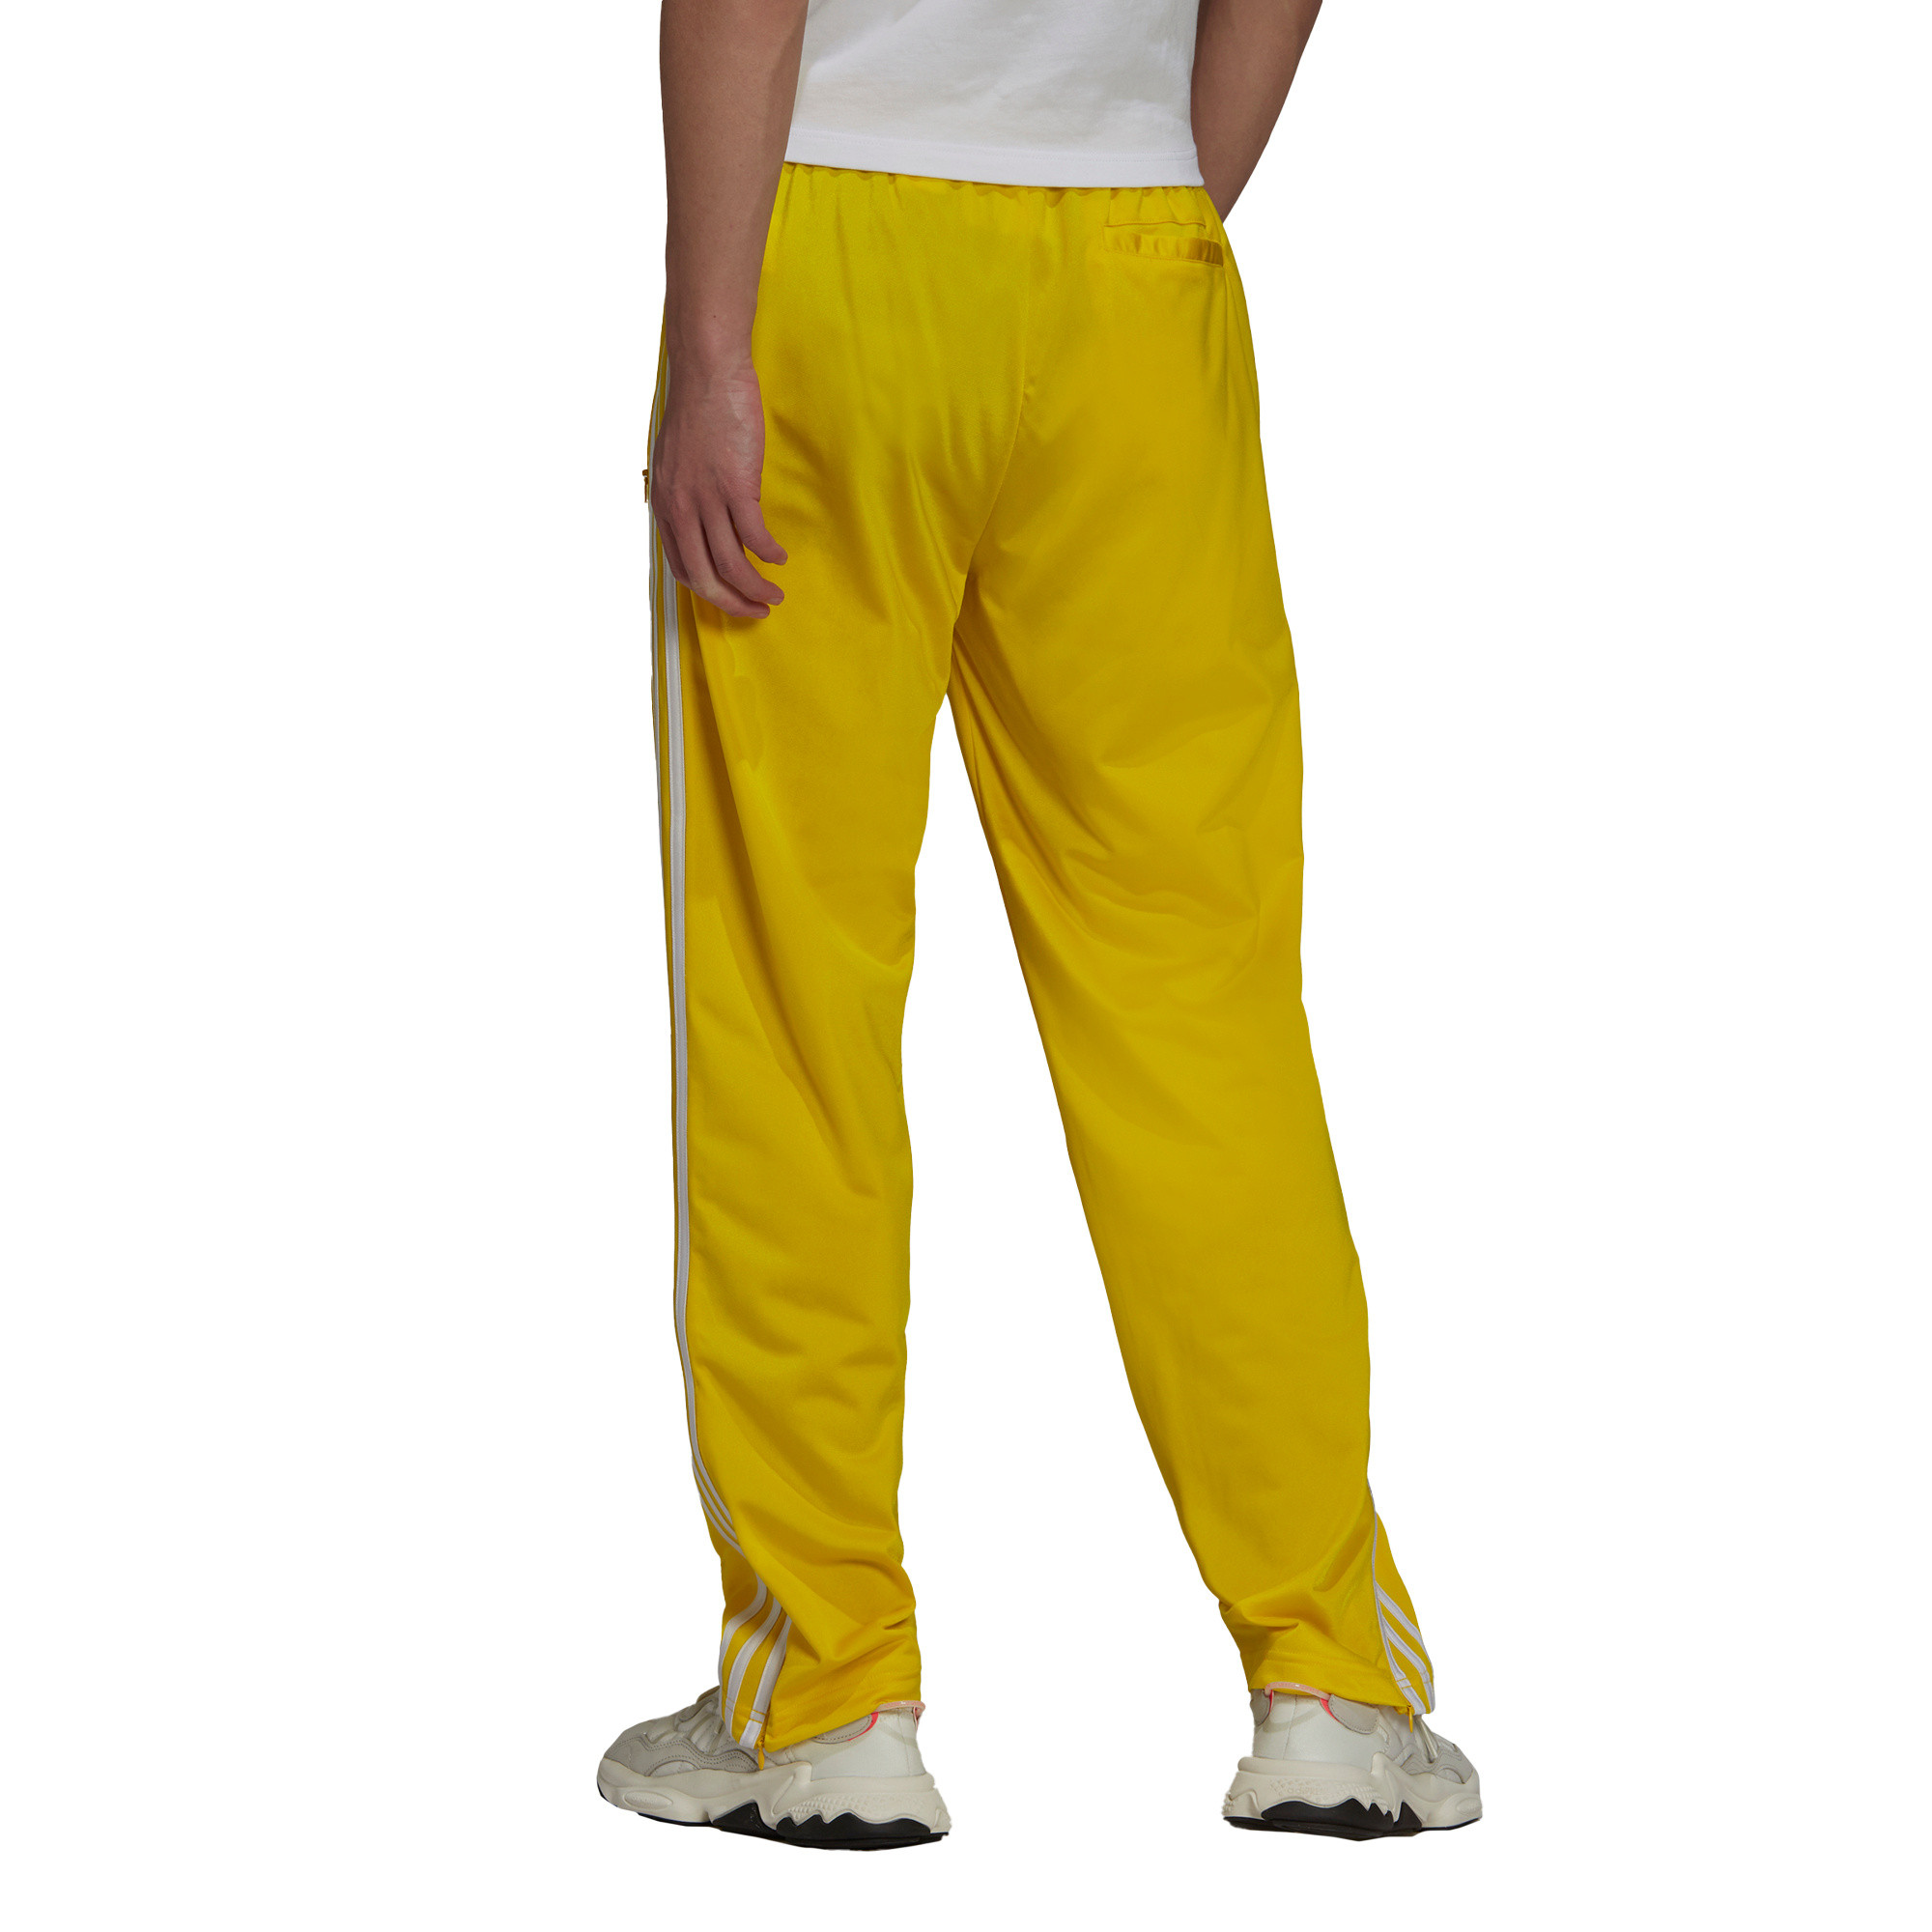 Pantaloni tuta uomo adicolor Classics Firebird Primeblue, Giallo, large image number 2